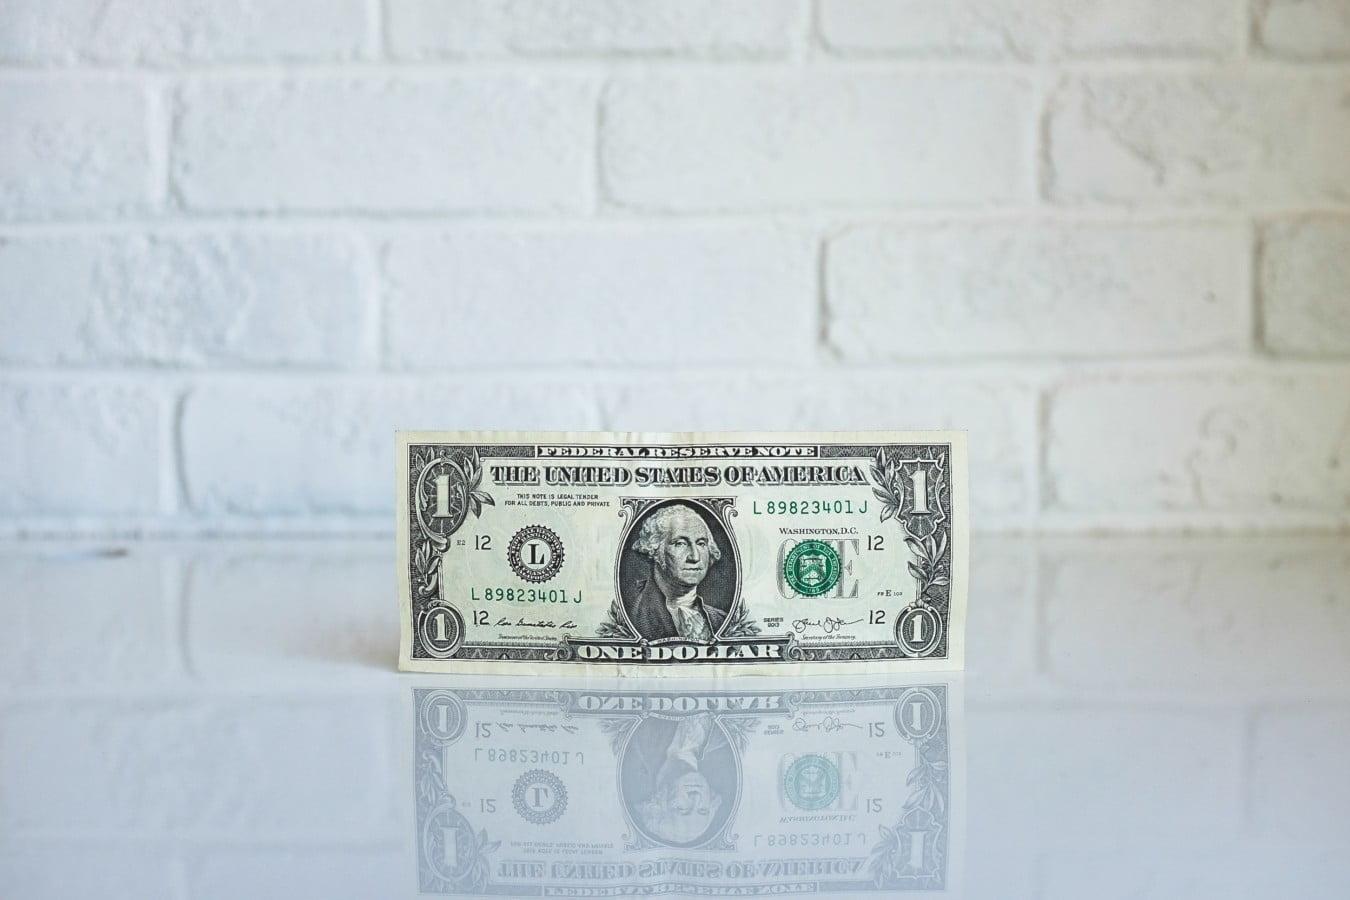 Lowering Brand Bids Can Help Increase Conversions